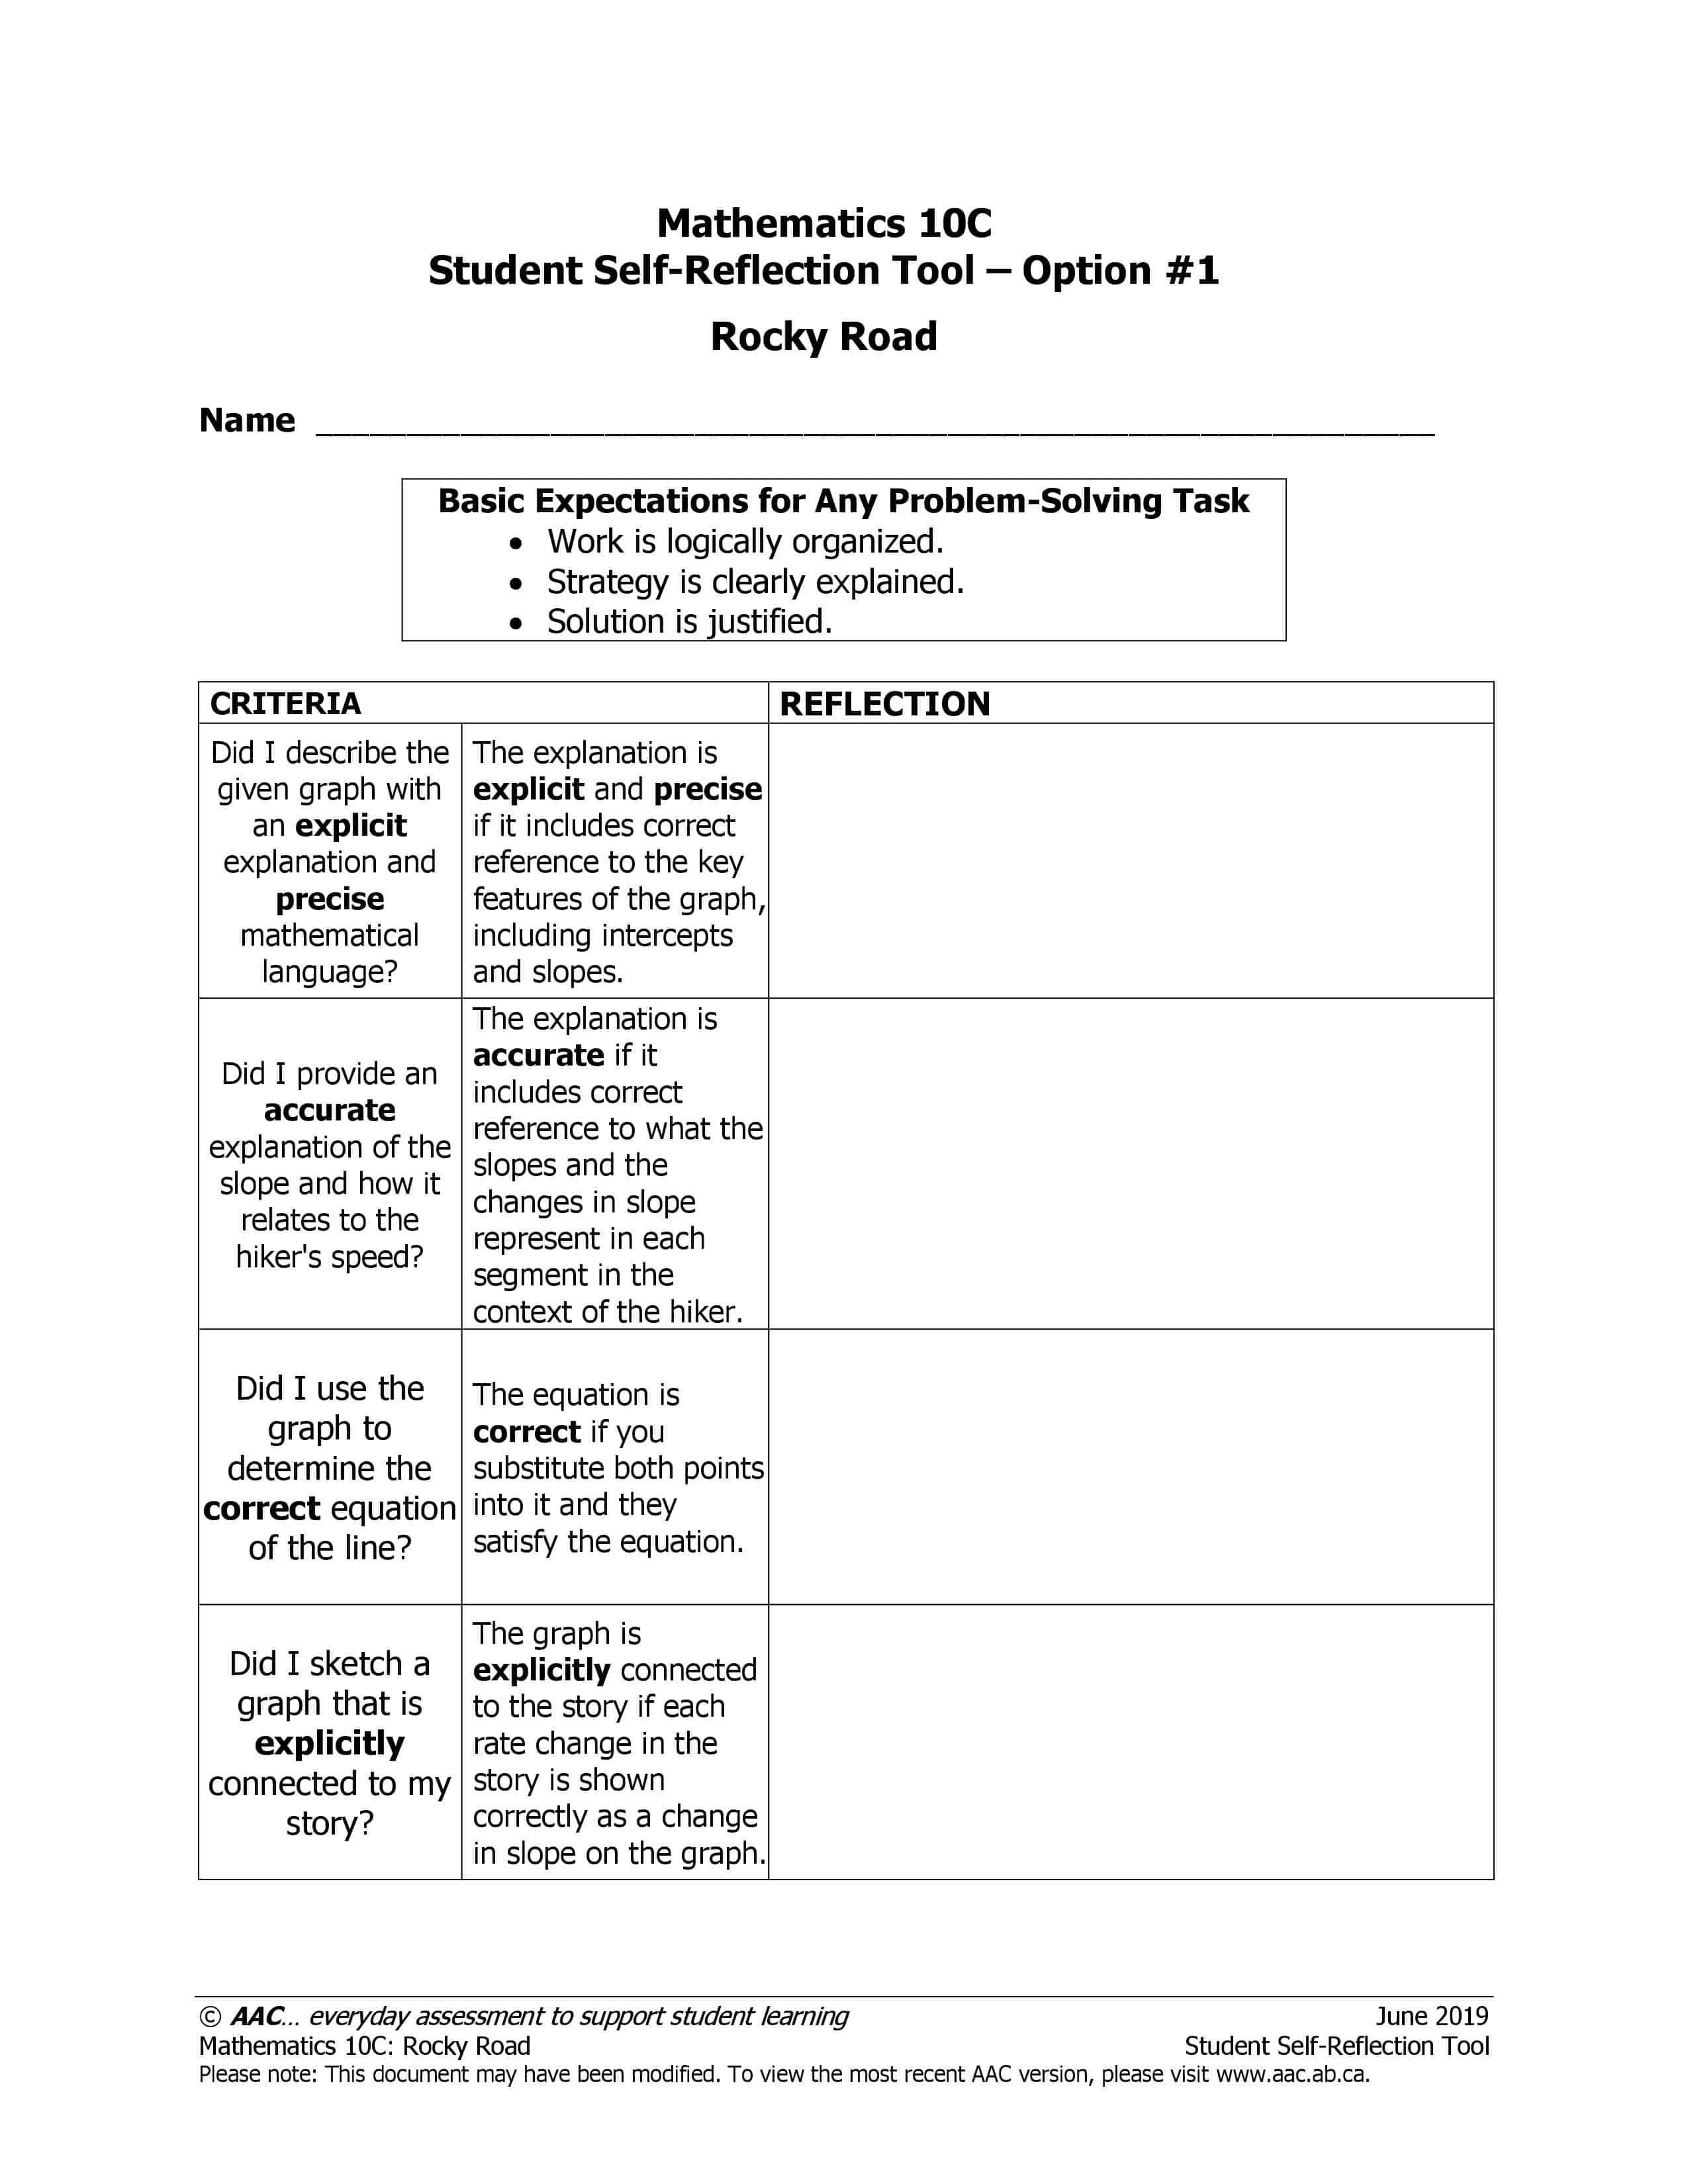 Rocky Road (10C) - Alberta Assessment Consortium